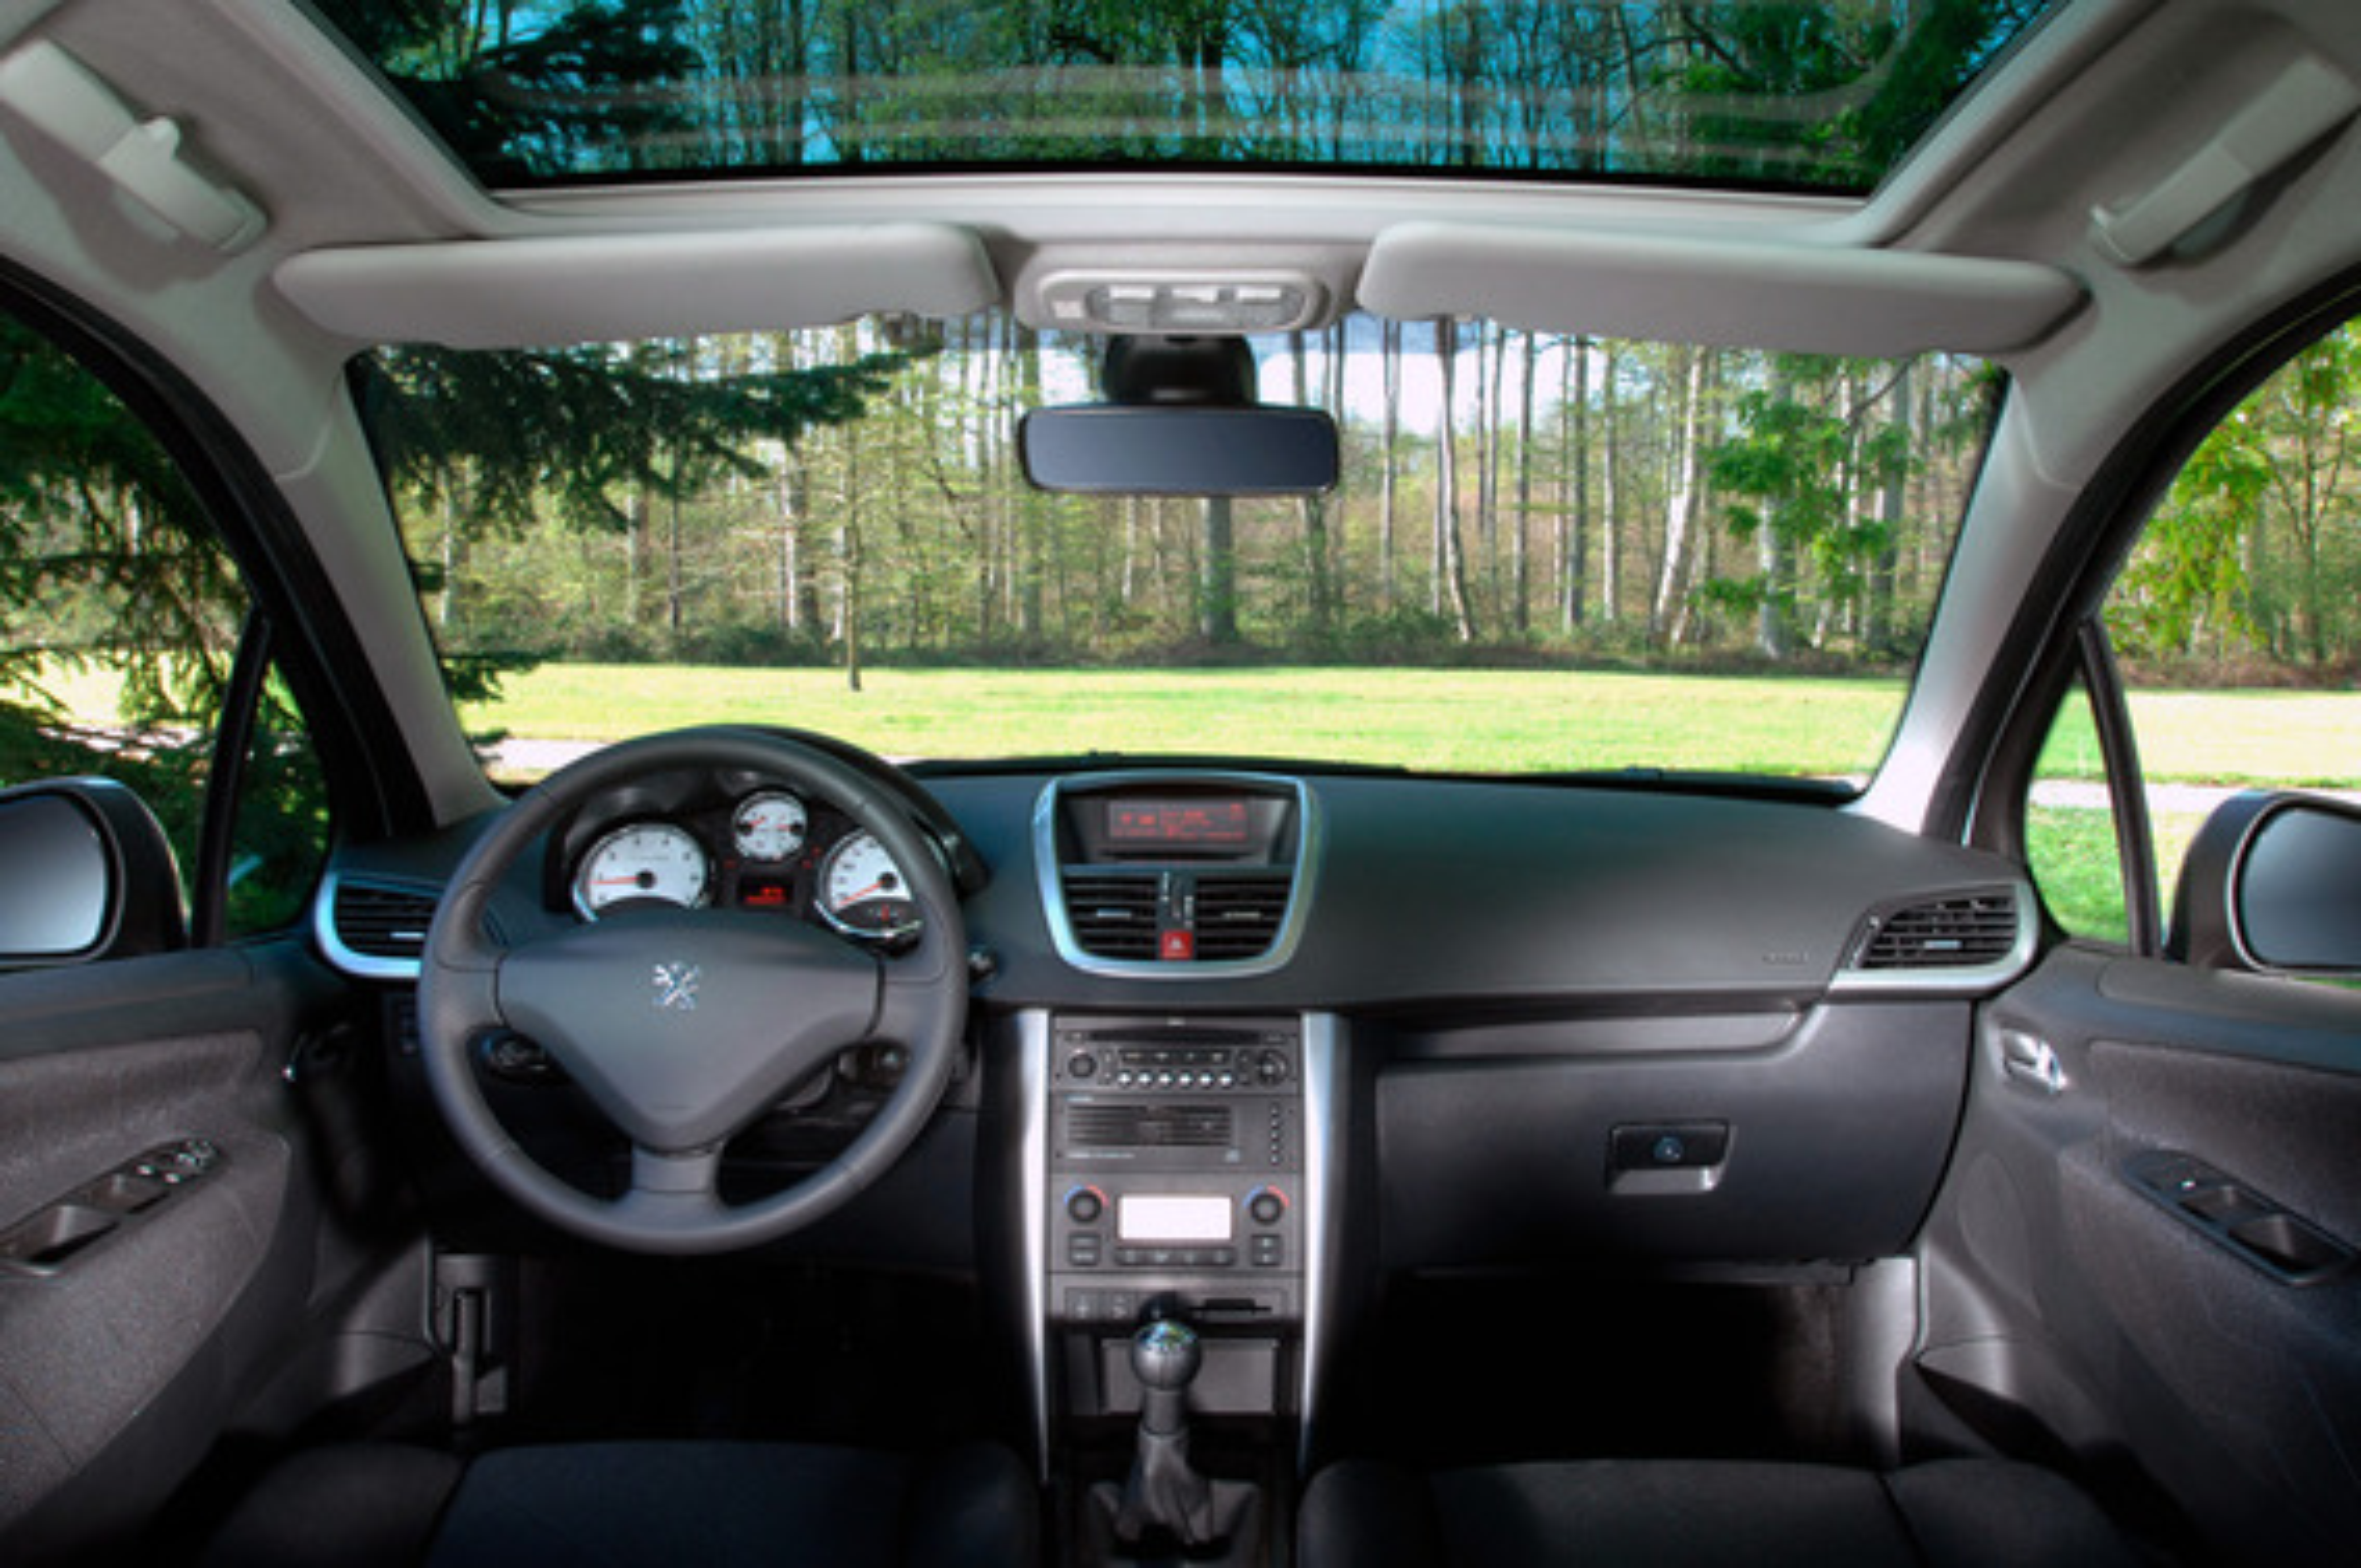 В Peugeot 207 дребезжат дефлекторы вентиляции на передней панели